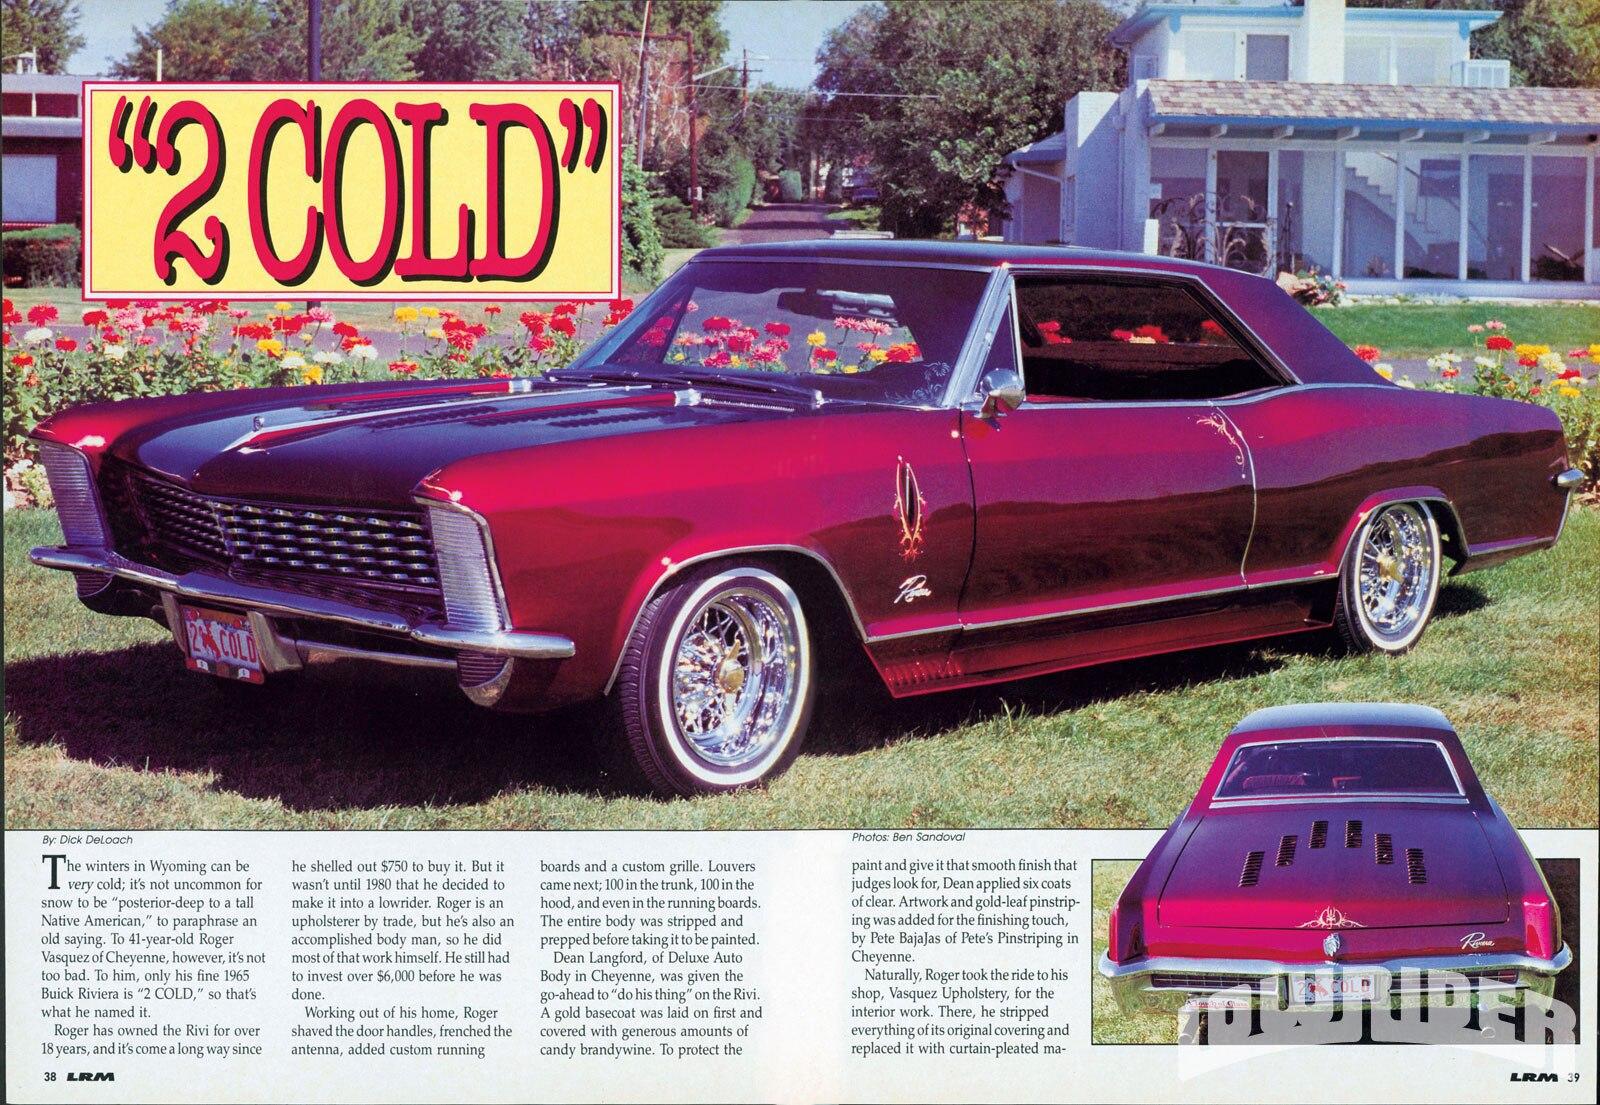 1207-lrmp-78-o-lowrider-magazine-1991-1992-35-years-of-lowrider1